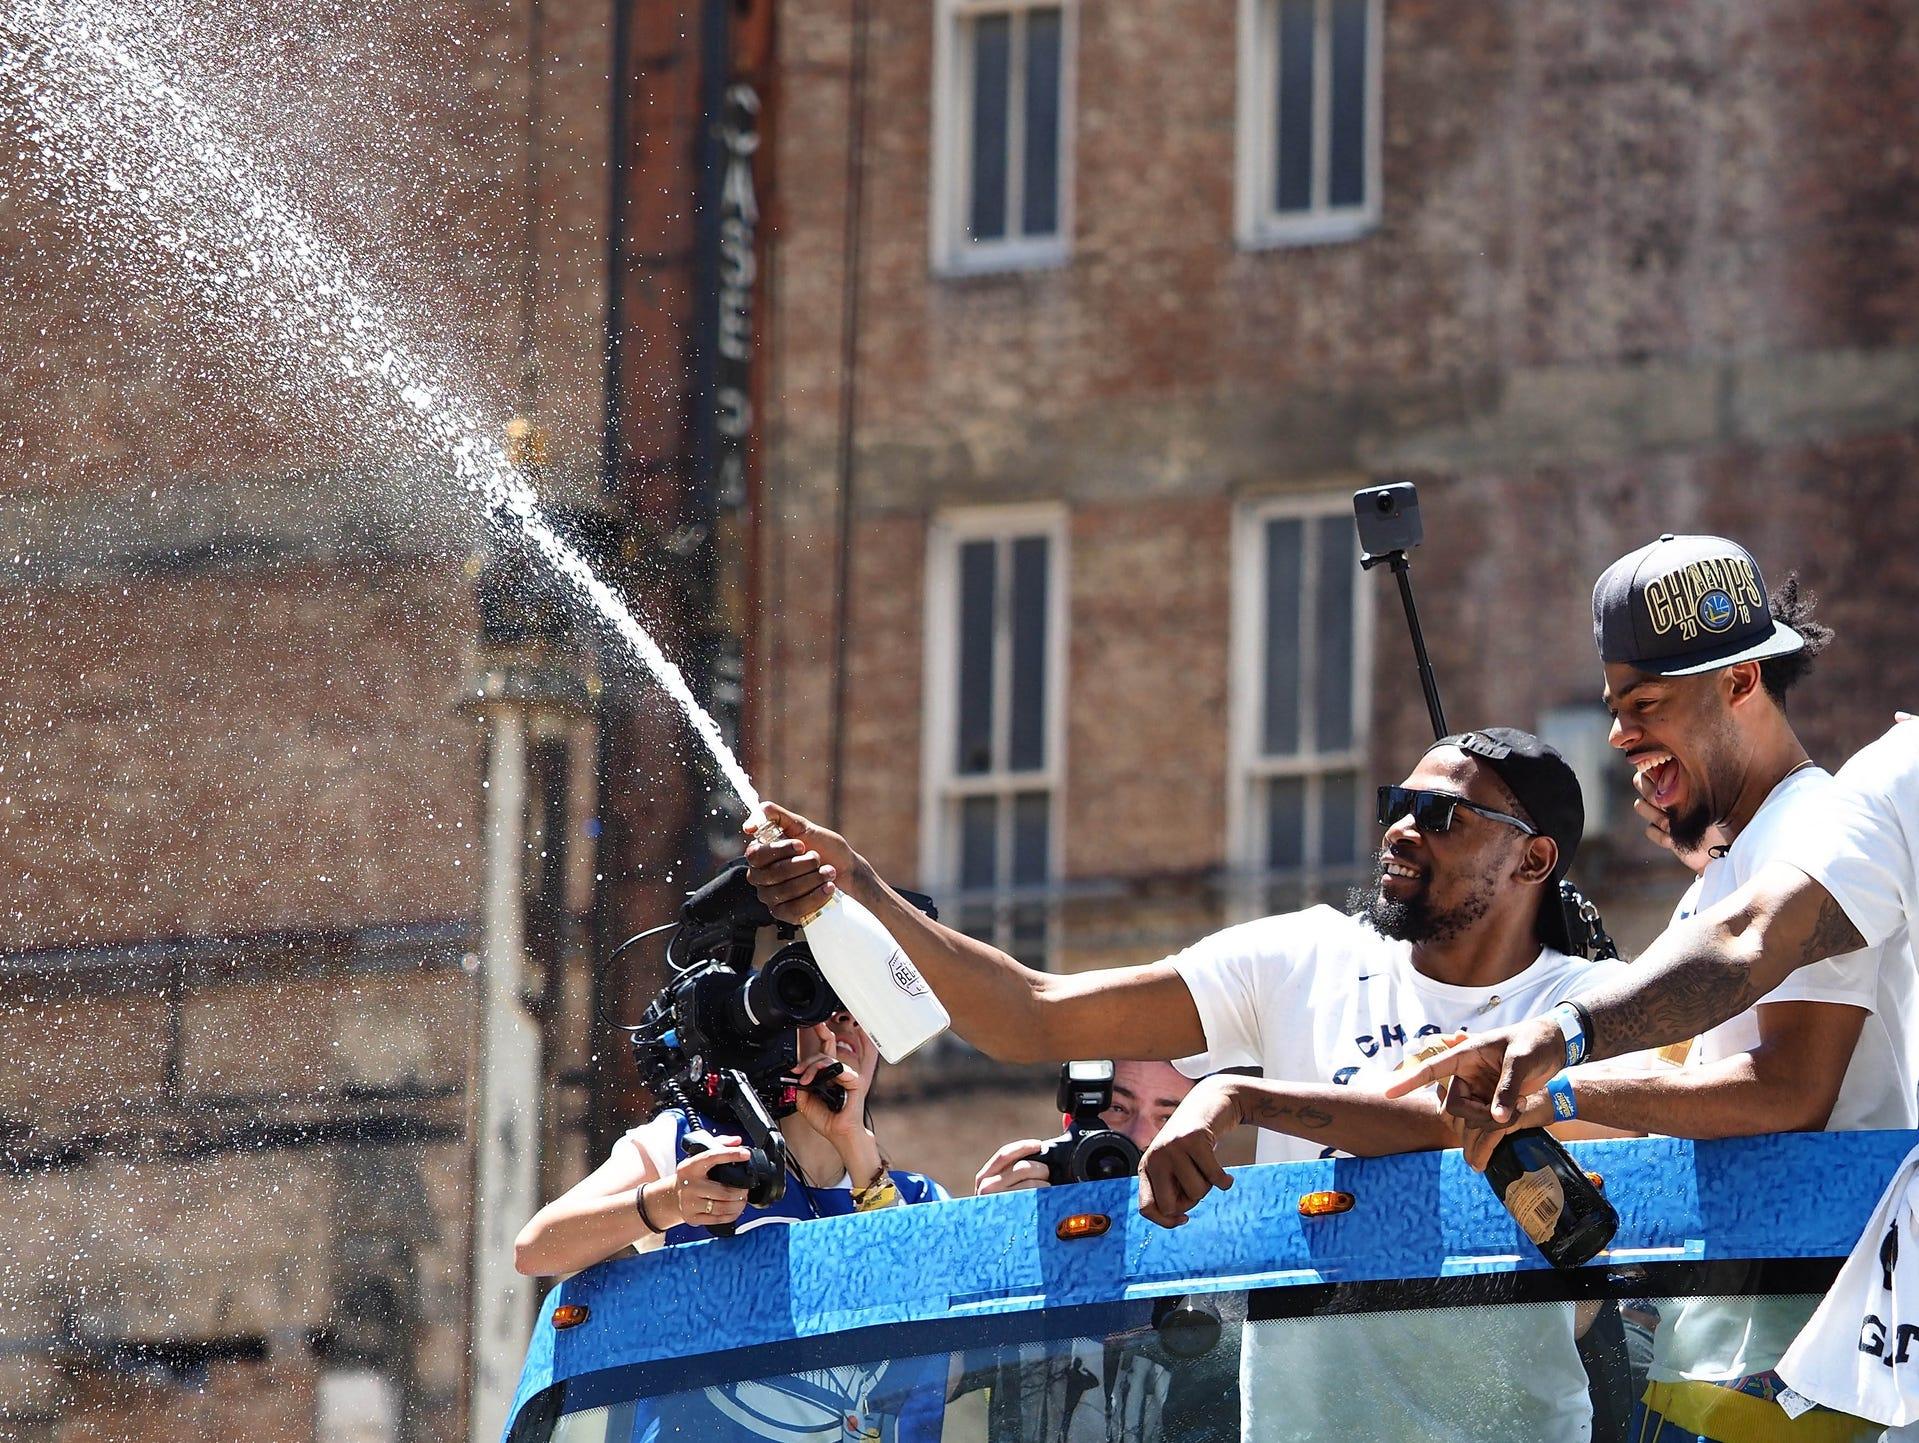 Golden State Warriors forward Kevin Durant (35) sprays